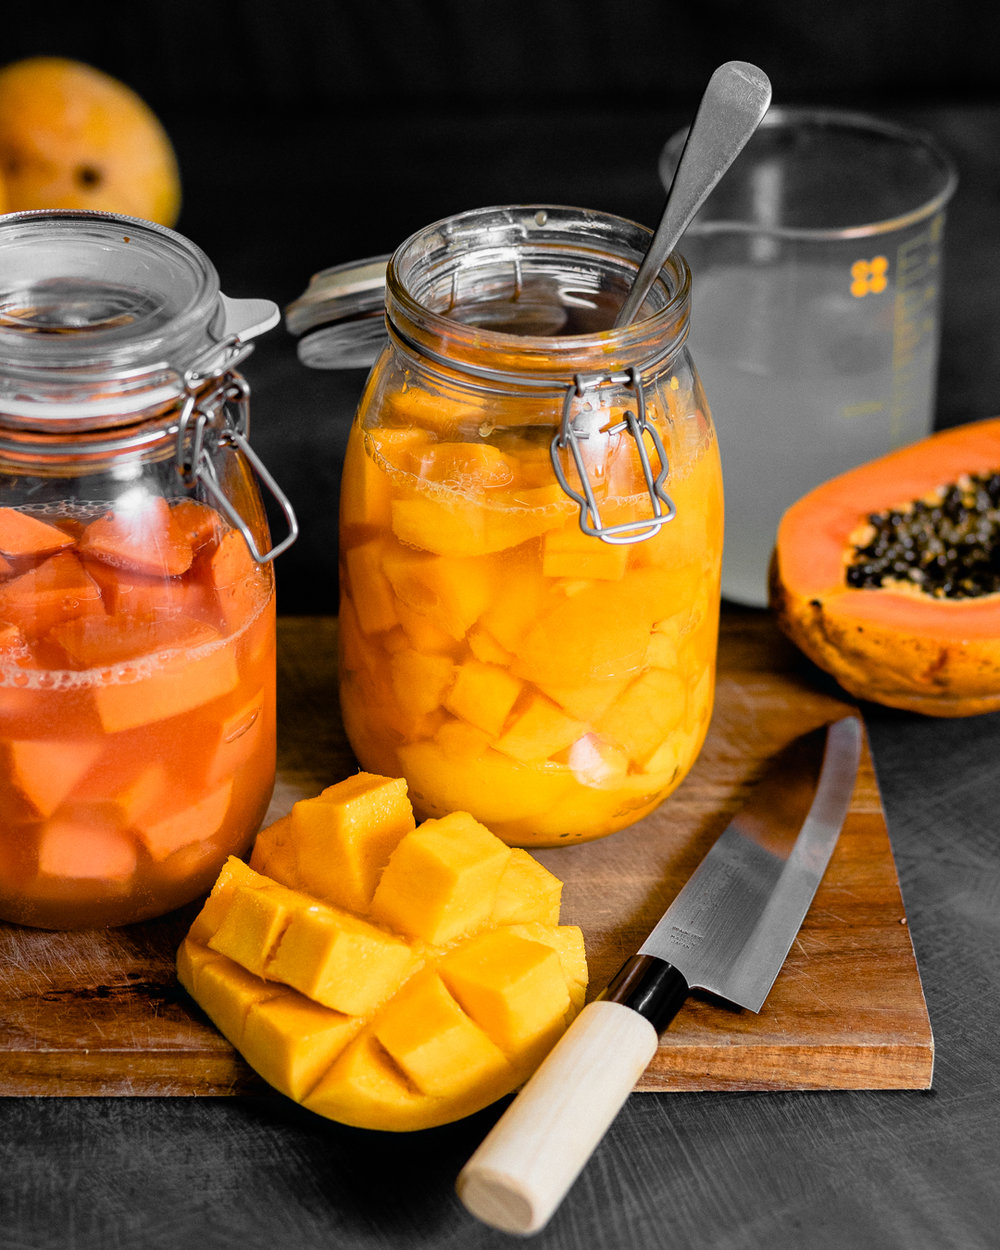 Fermented_Papaya_and_Mango1_by_Jordan_Pie_Nutritionist_Photographer-1.jpg